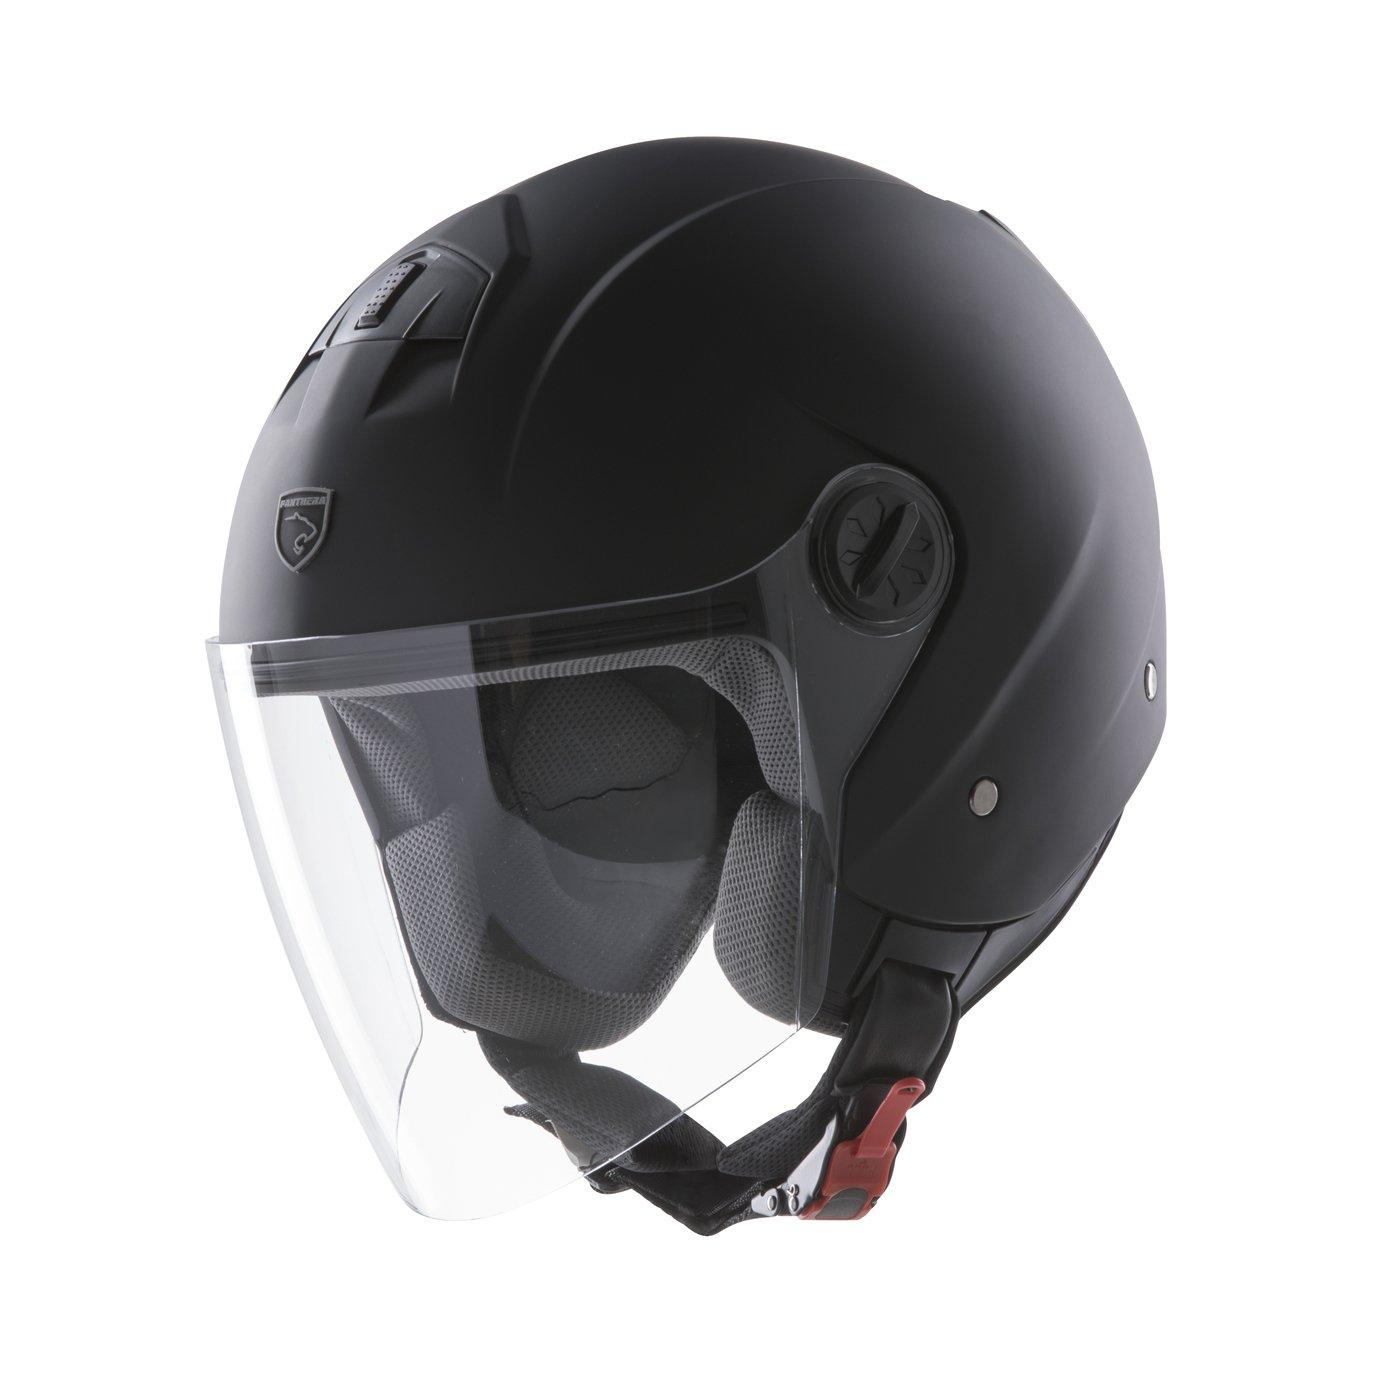 Panthera casco de moto full jet Trendy negro mate talla XL